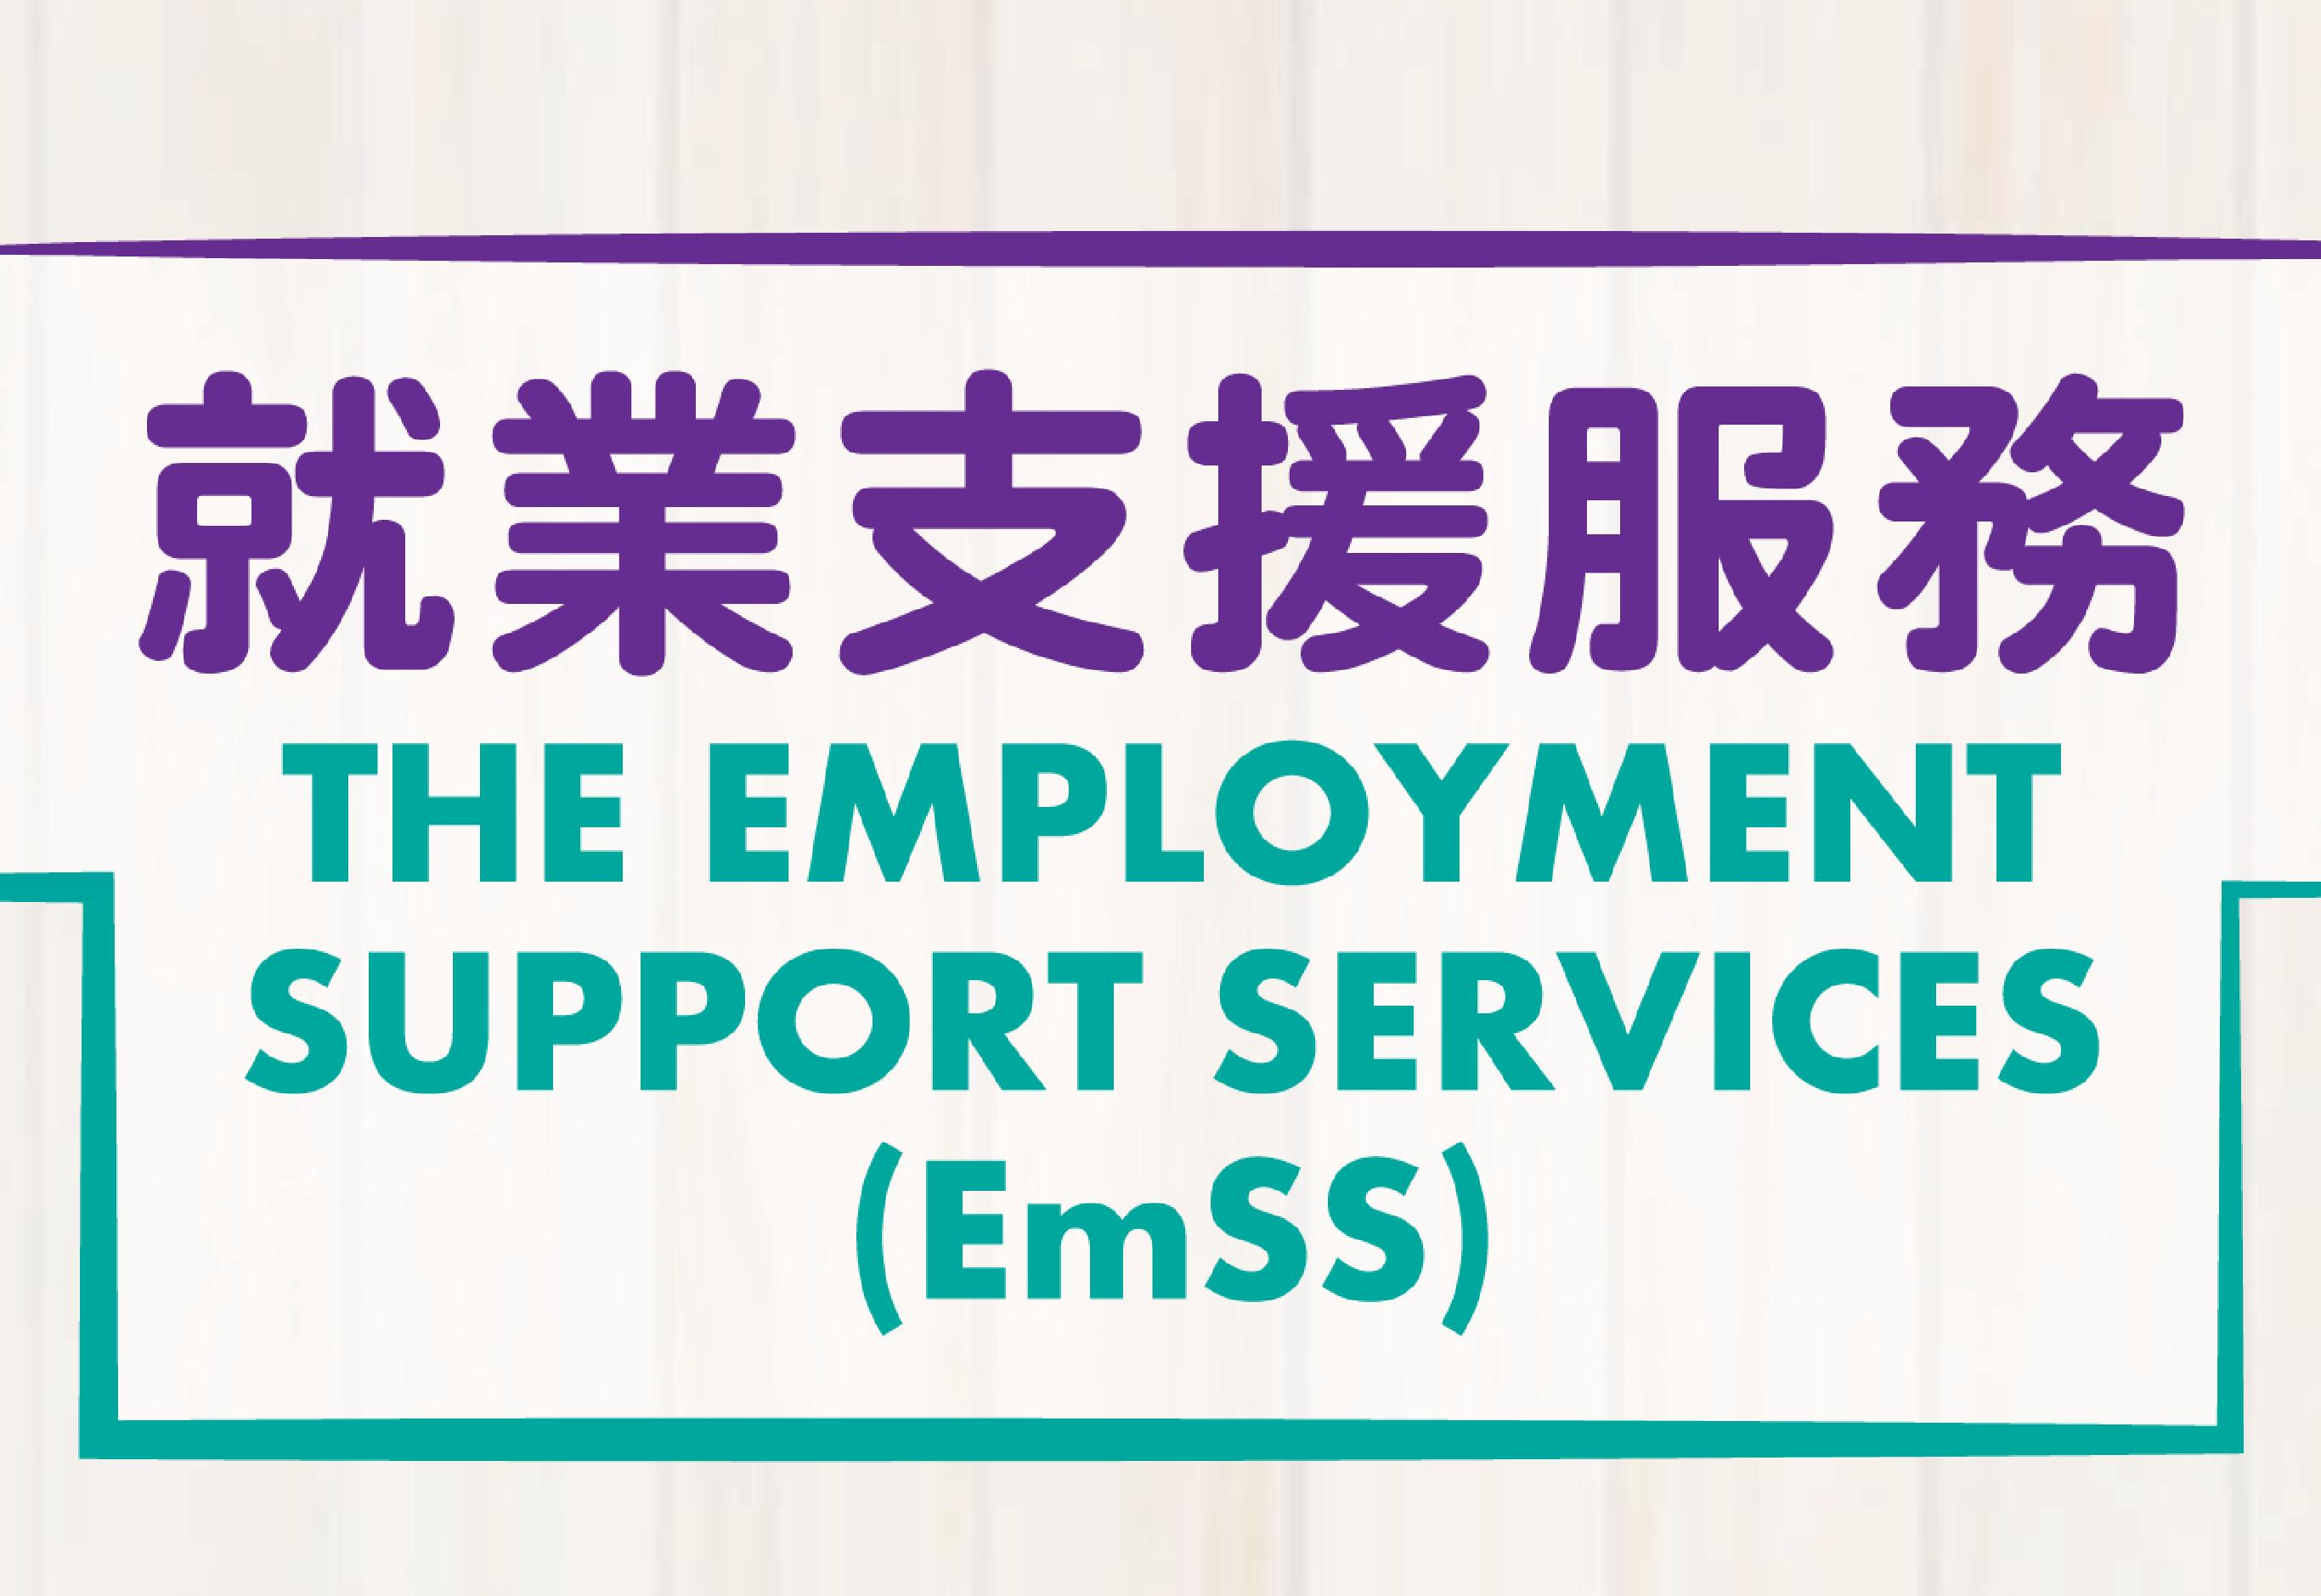 "<a href=""http://mblcc.org.hk/?page_id=1835"">就業支援服務</a>"